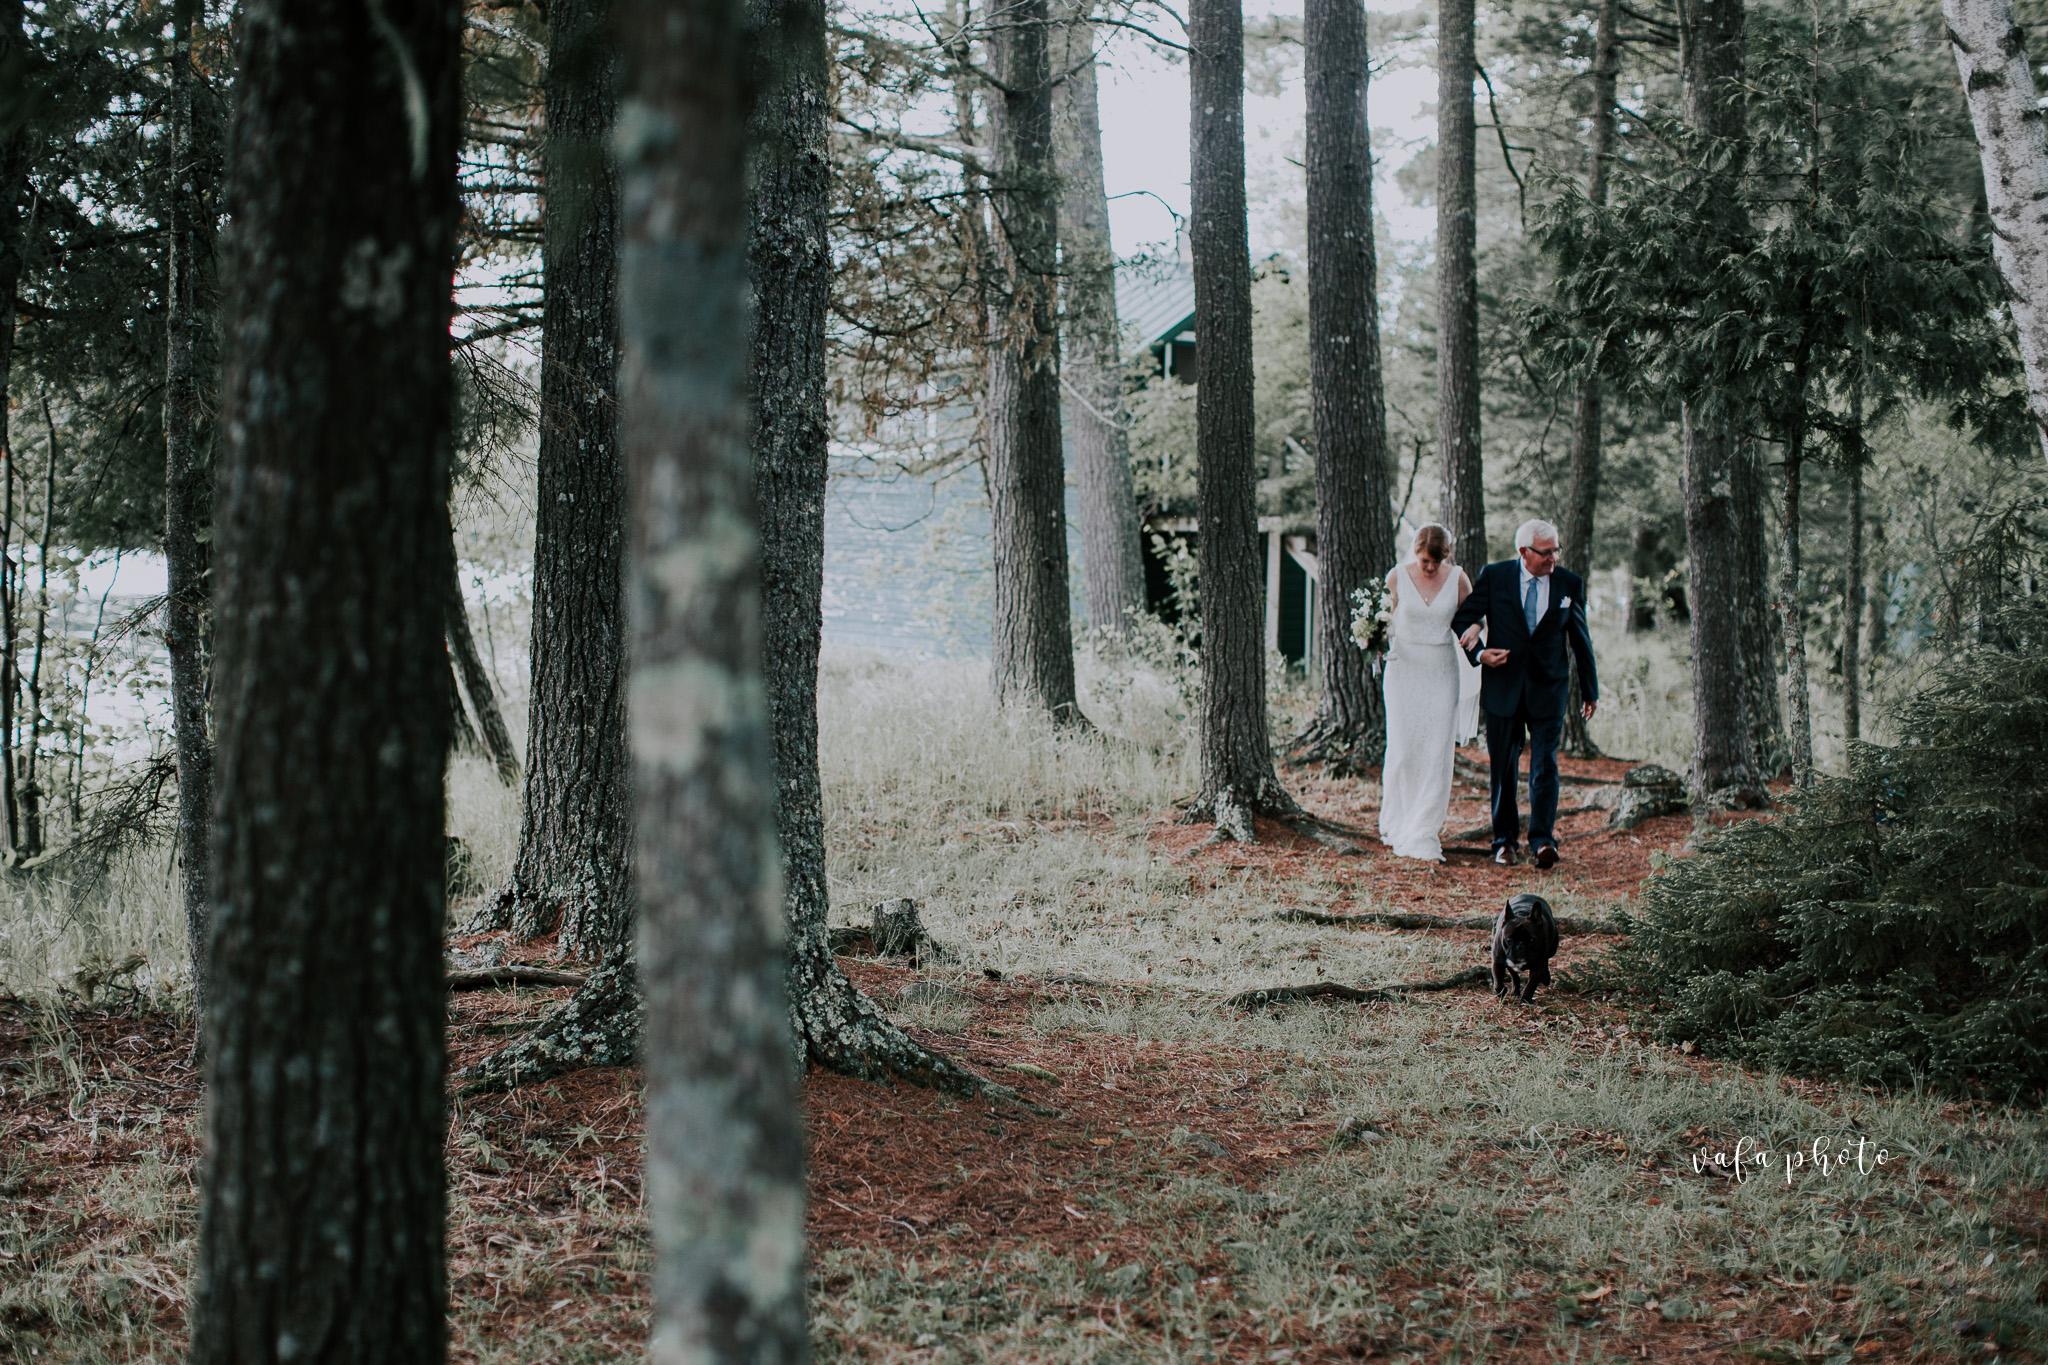 Michigan-Lake-House-Wedding-Madeline-Patrick-Vafa-Photo-283.jpg